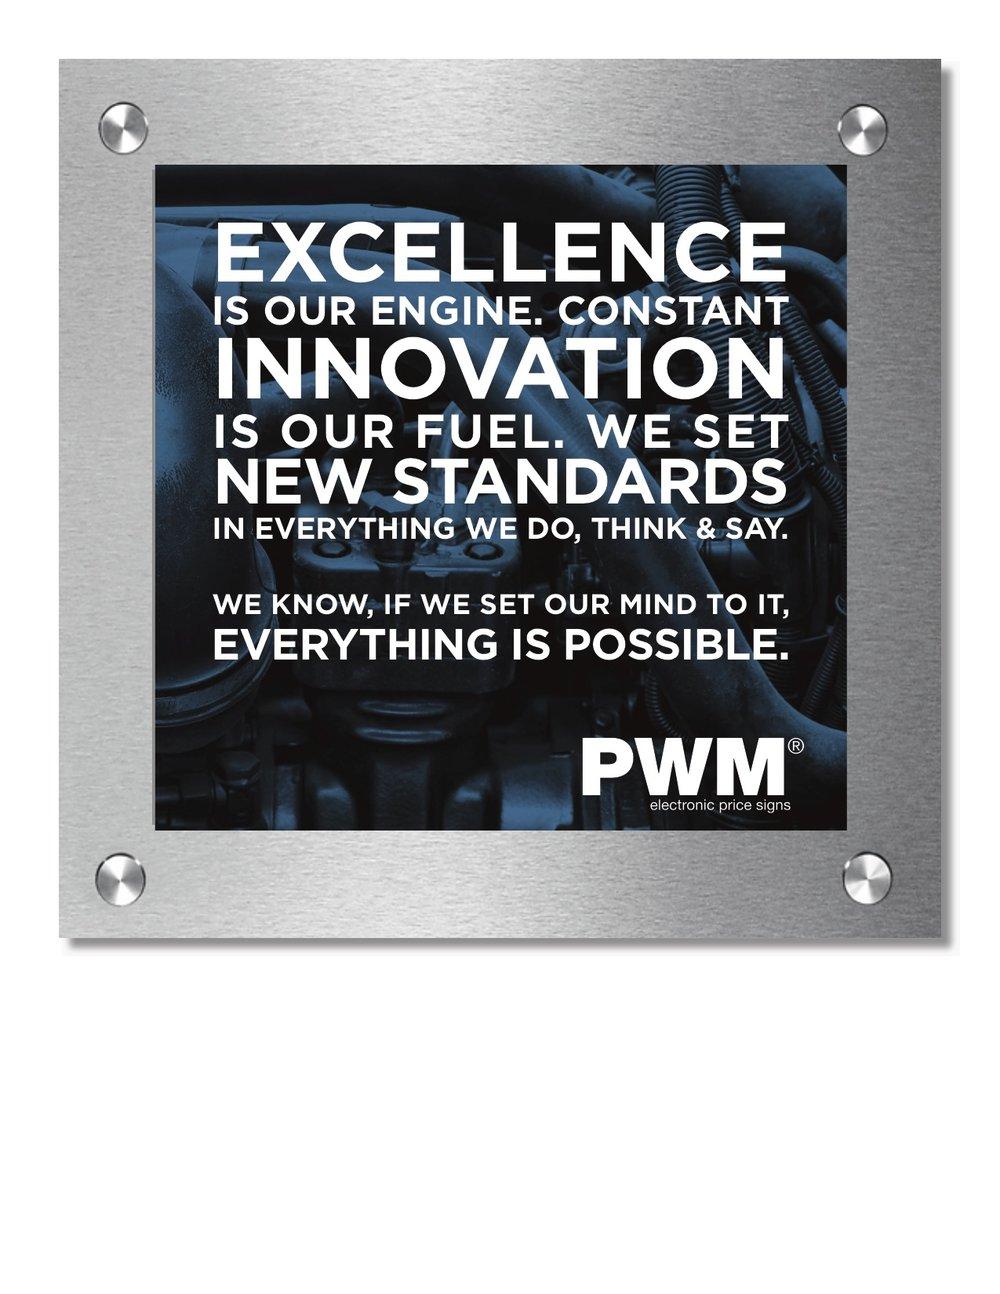 PWM: Vision